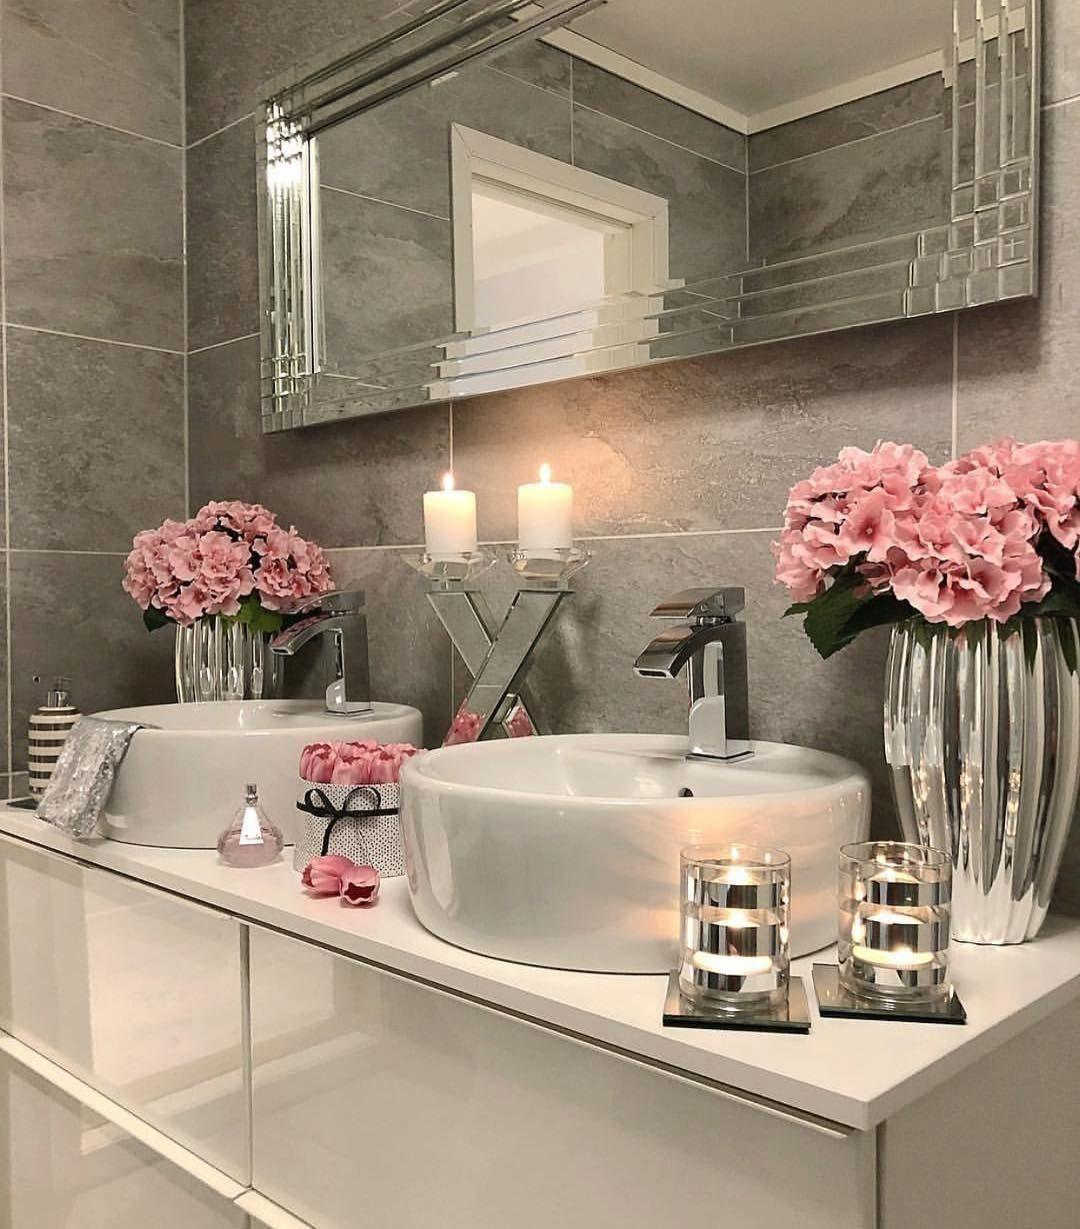 25 Stunning Shabby Chic Bathroom Designs That Will Adore You - Fcc28Db0Fe68E1Ef963Eae79054C0B2C